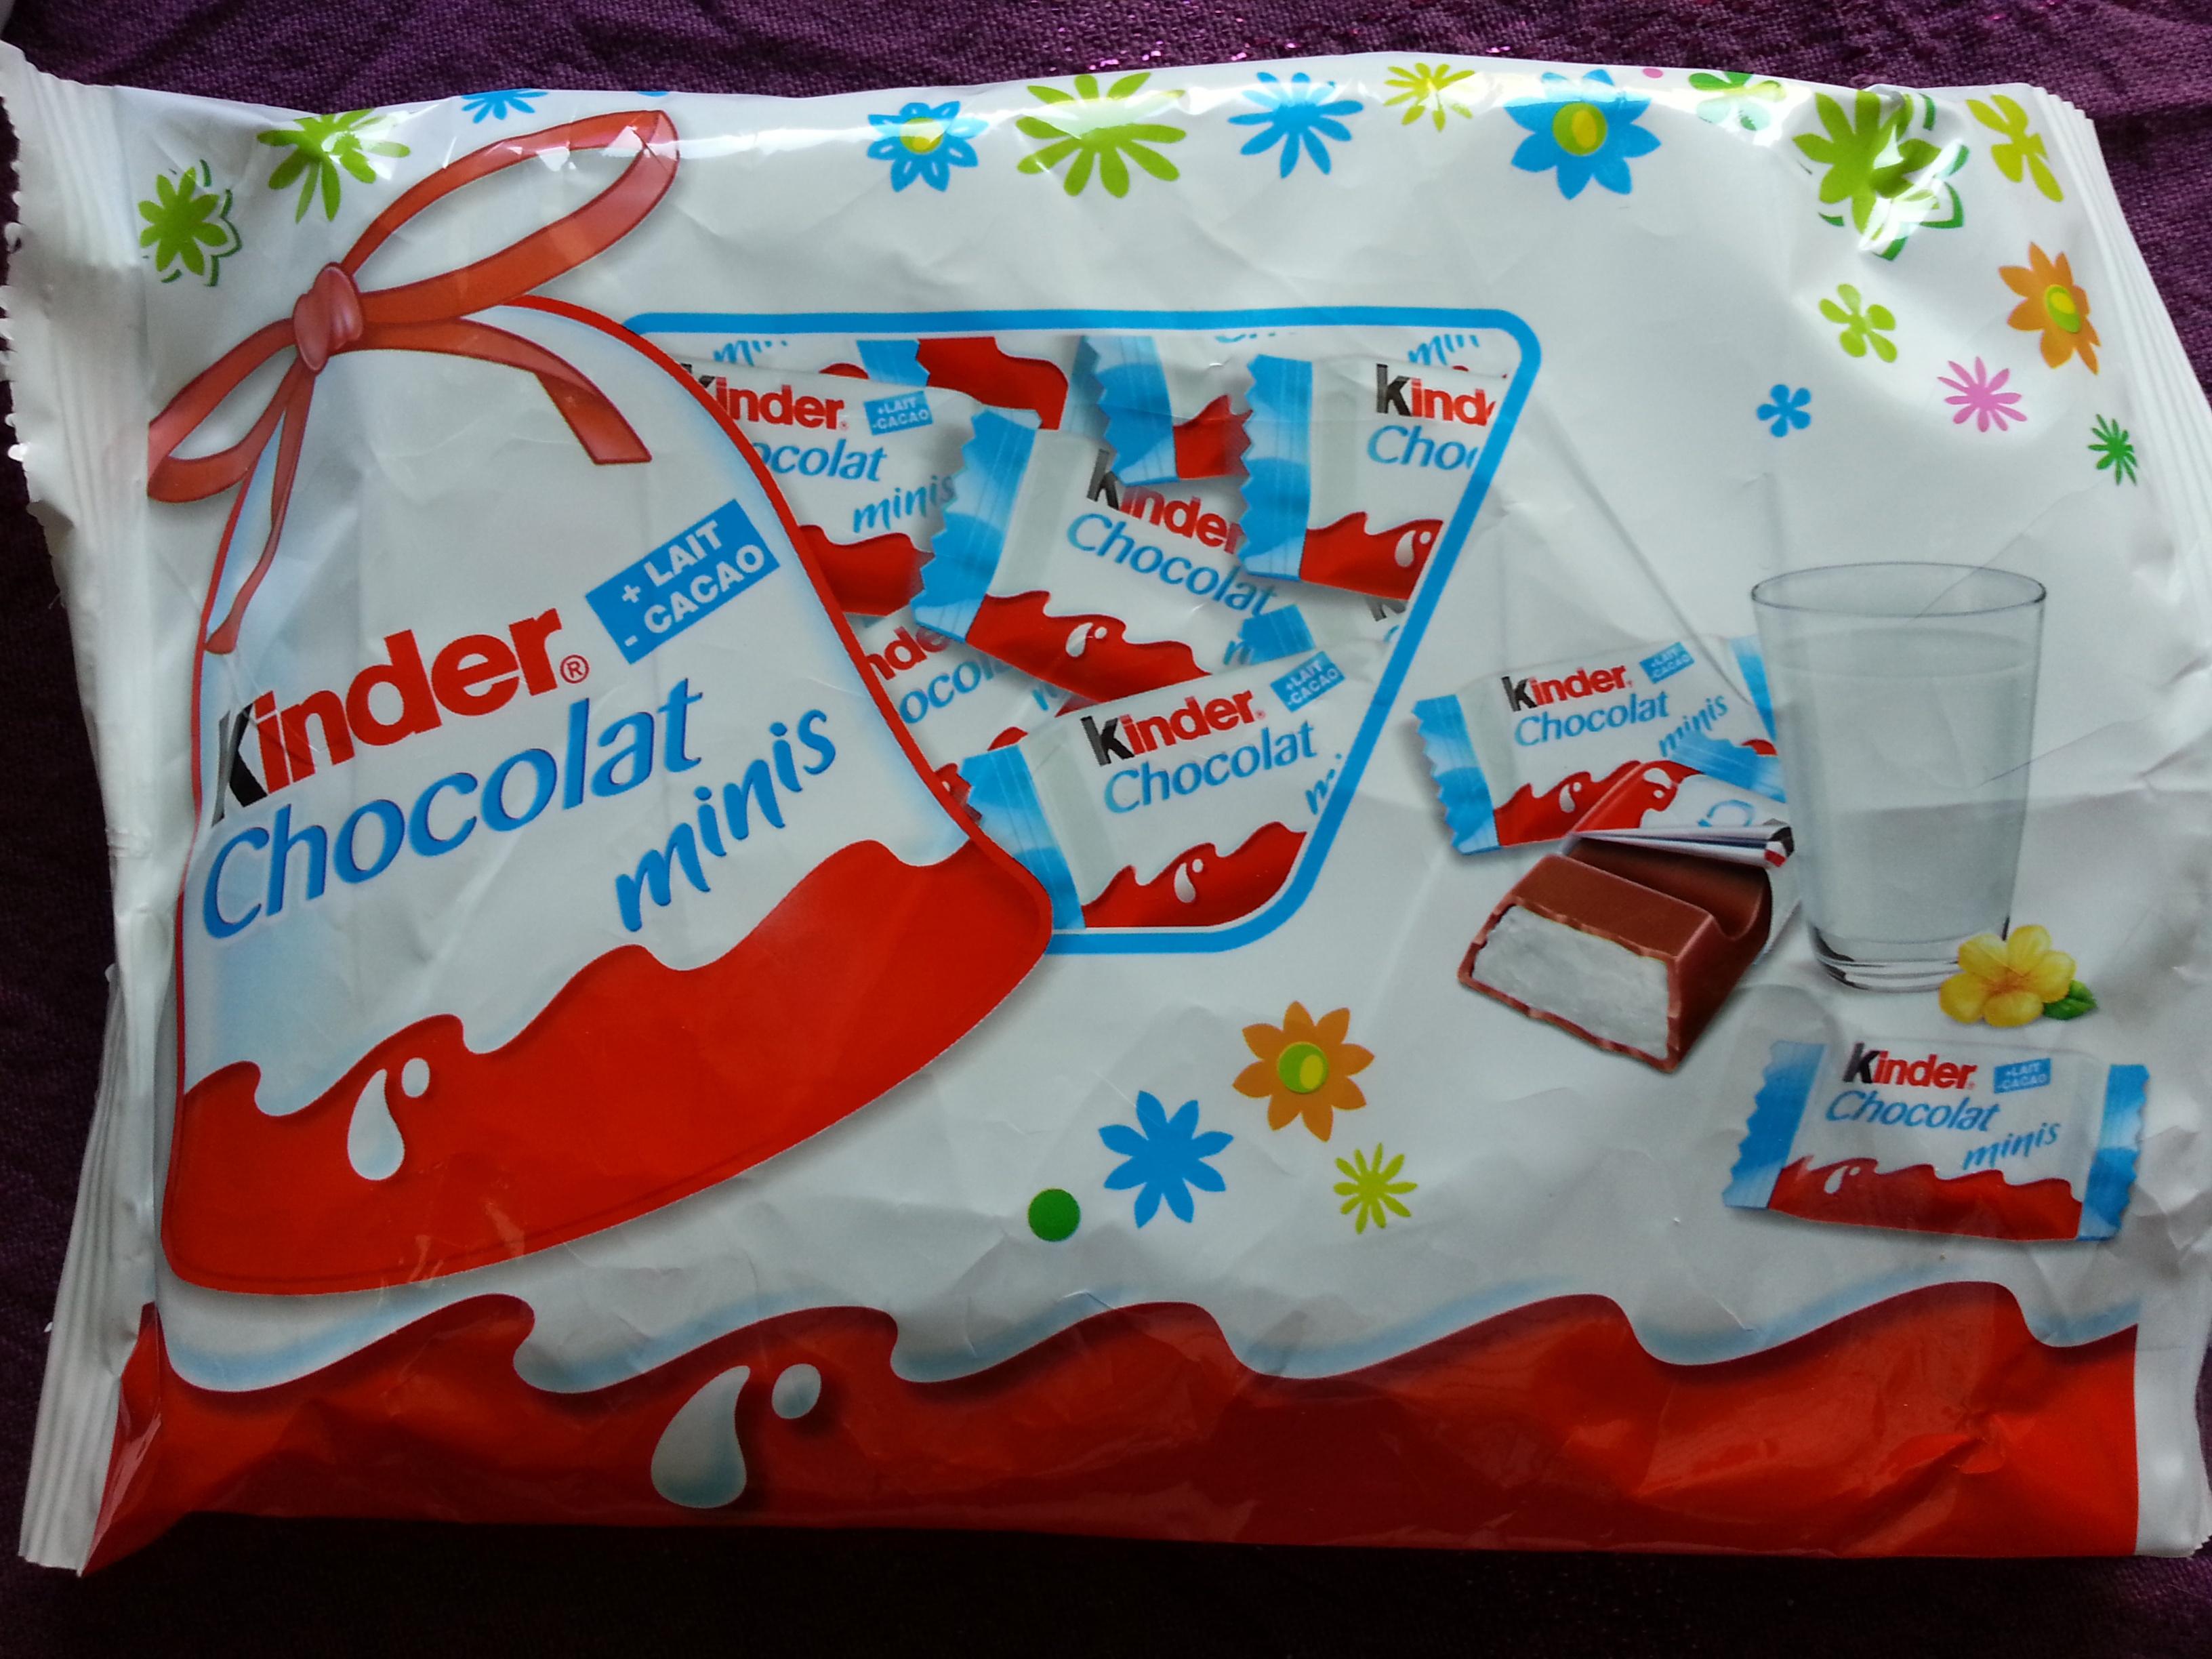 Kinder chocolat mini - Product - fr